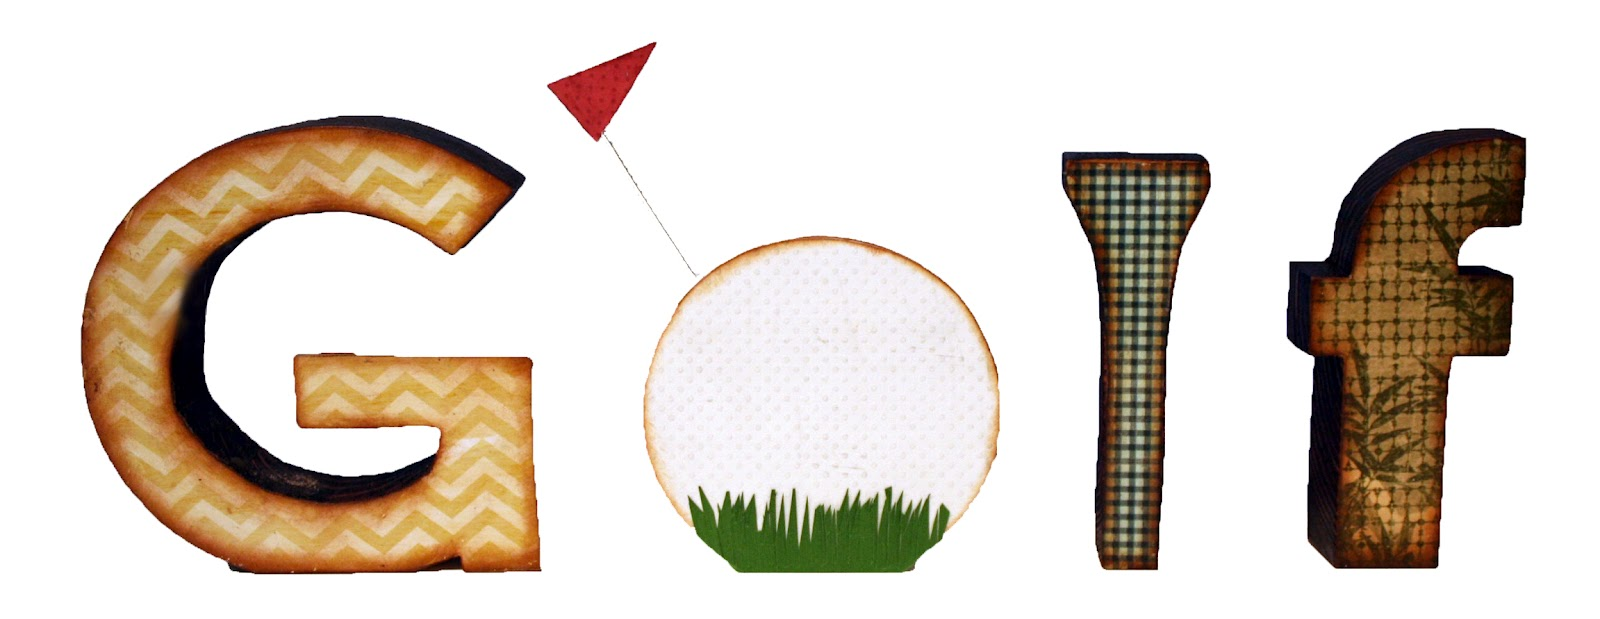 golf ball border clip art - photo #31